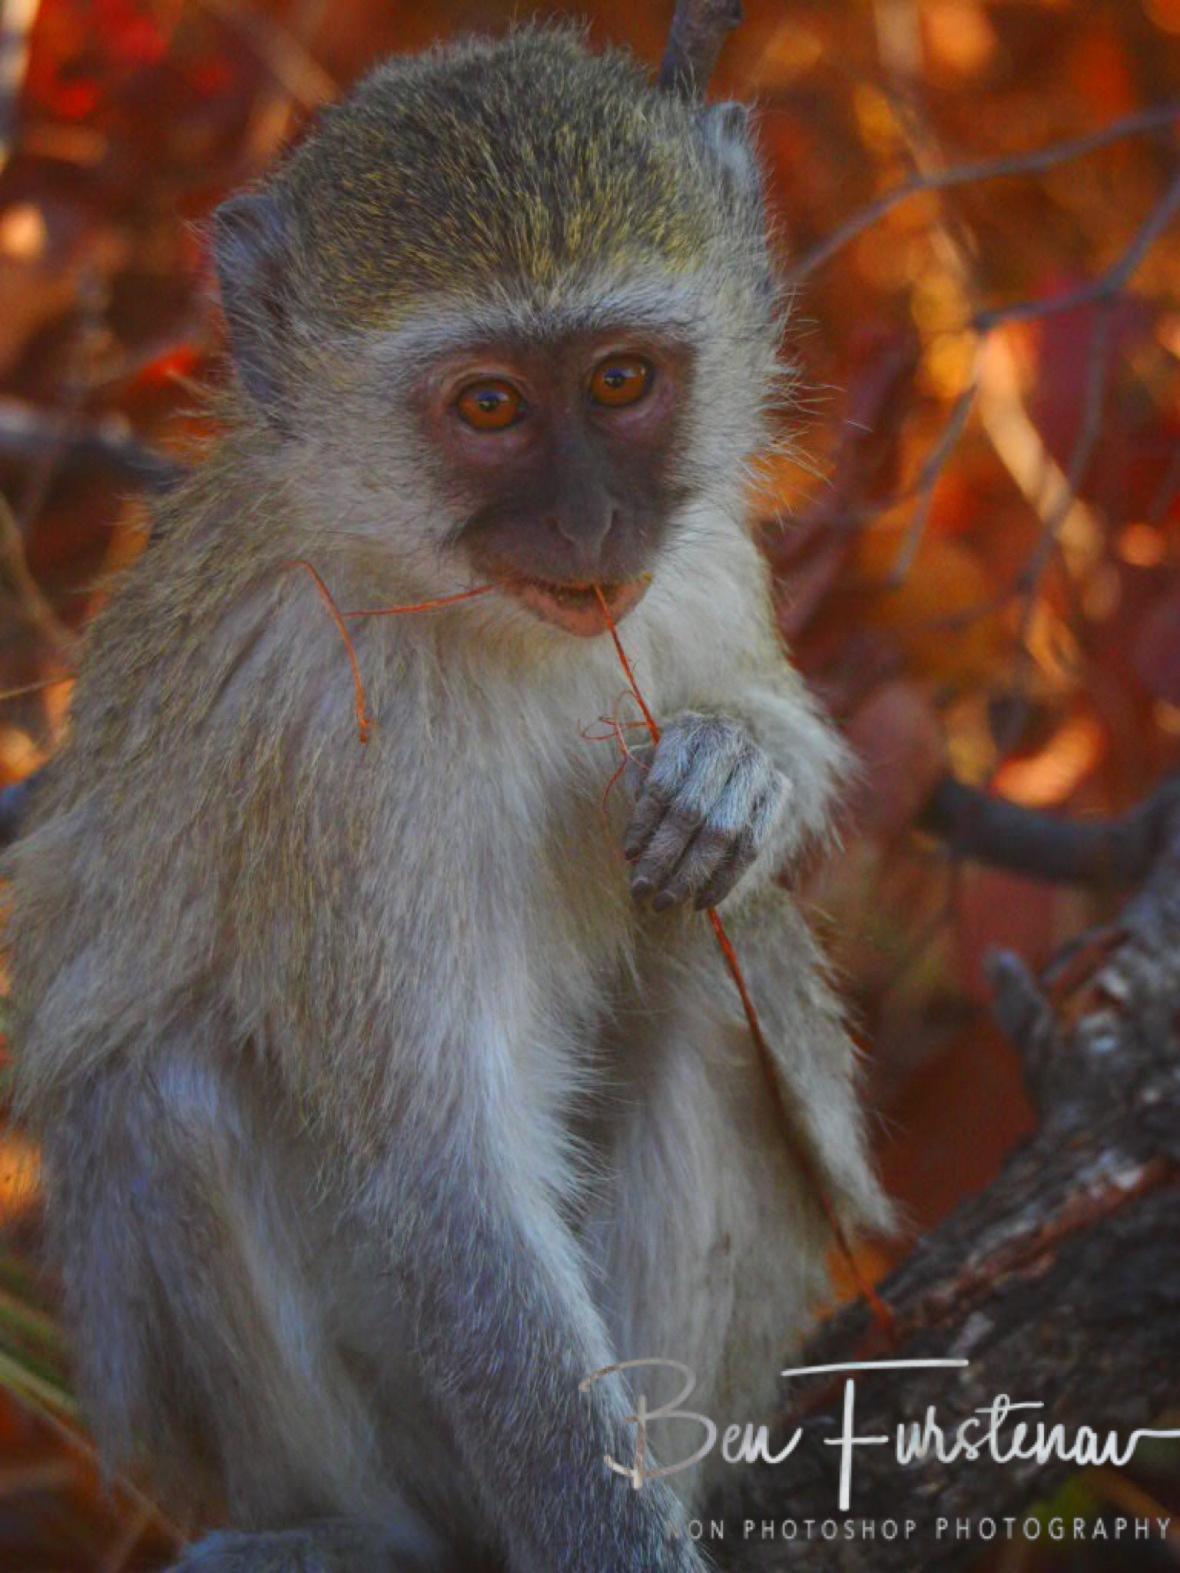 Still chewing, Moremi National Park, Okavango Delta, Botswana